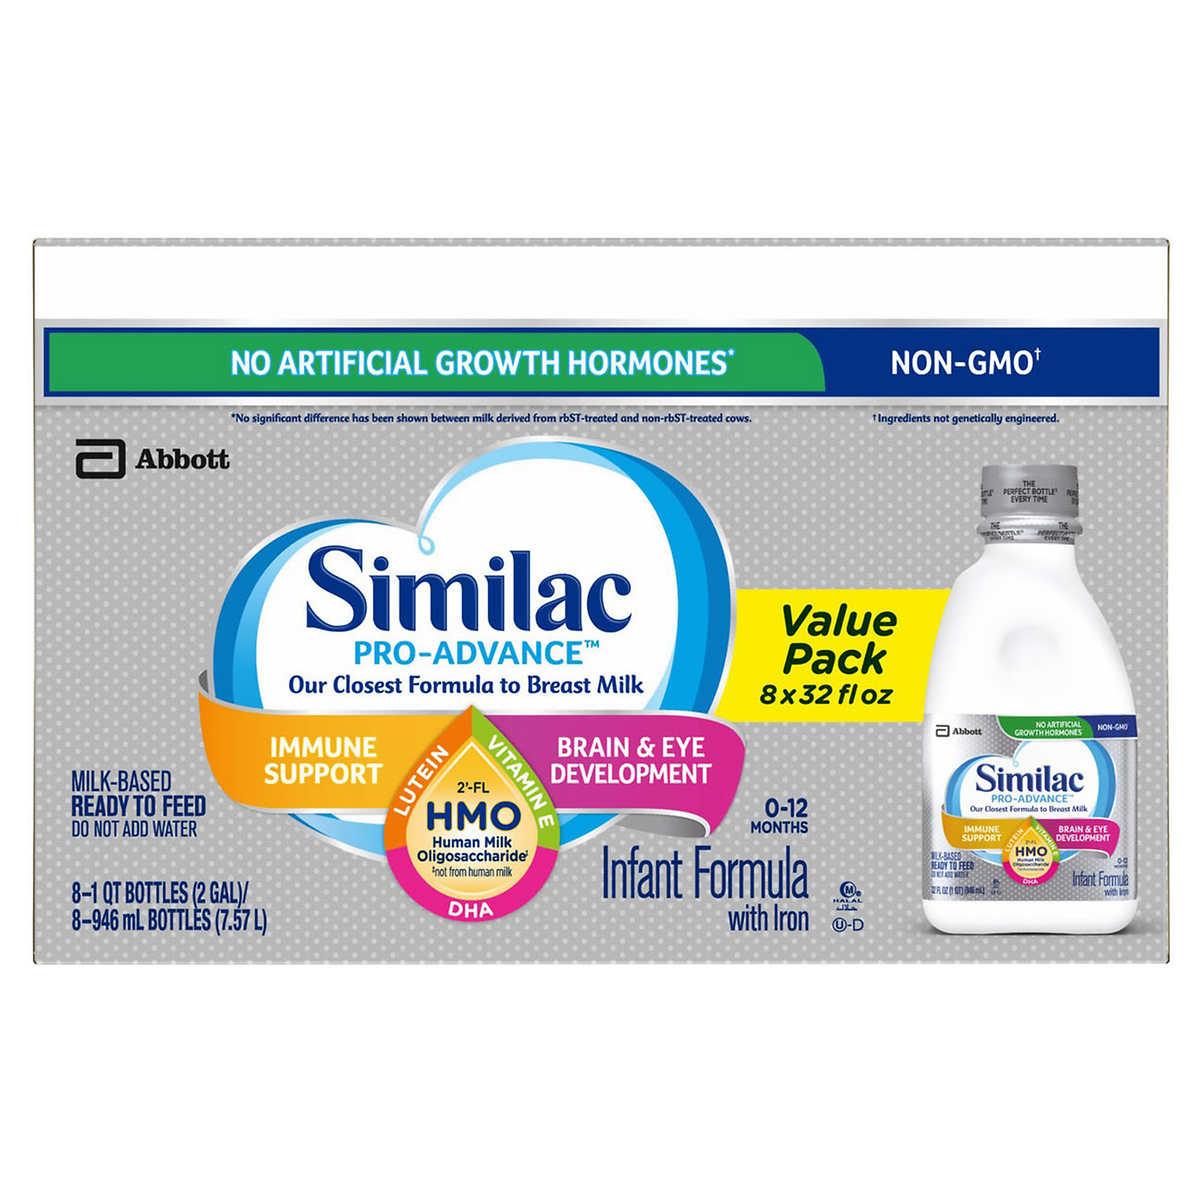 Alimentum Ready To Feed 2 Oz similac pro-advance hmo ready to feed infant formula 8-count, 32 fl oz